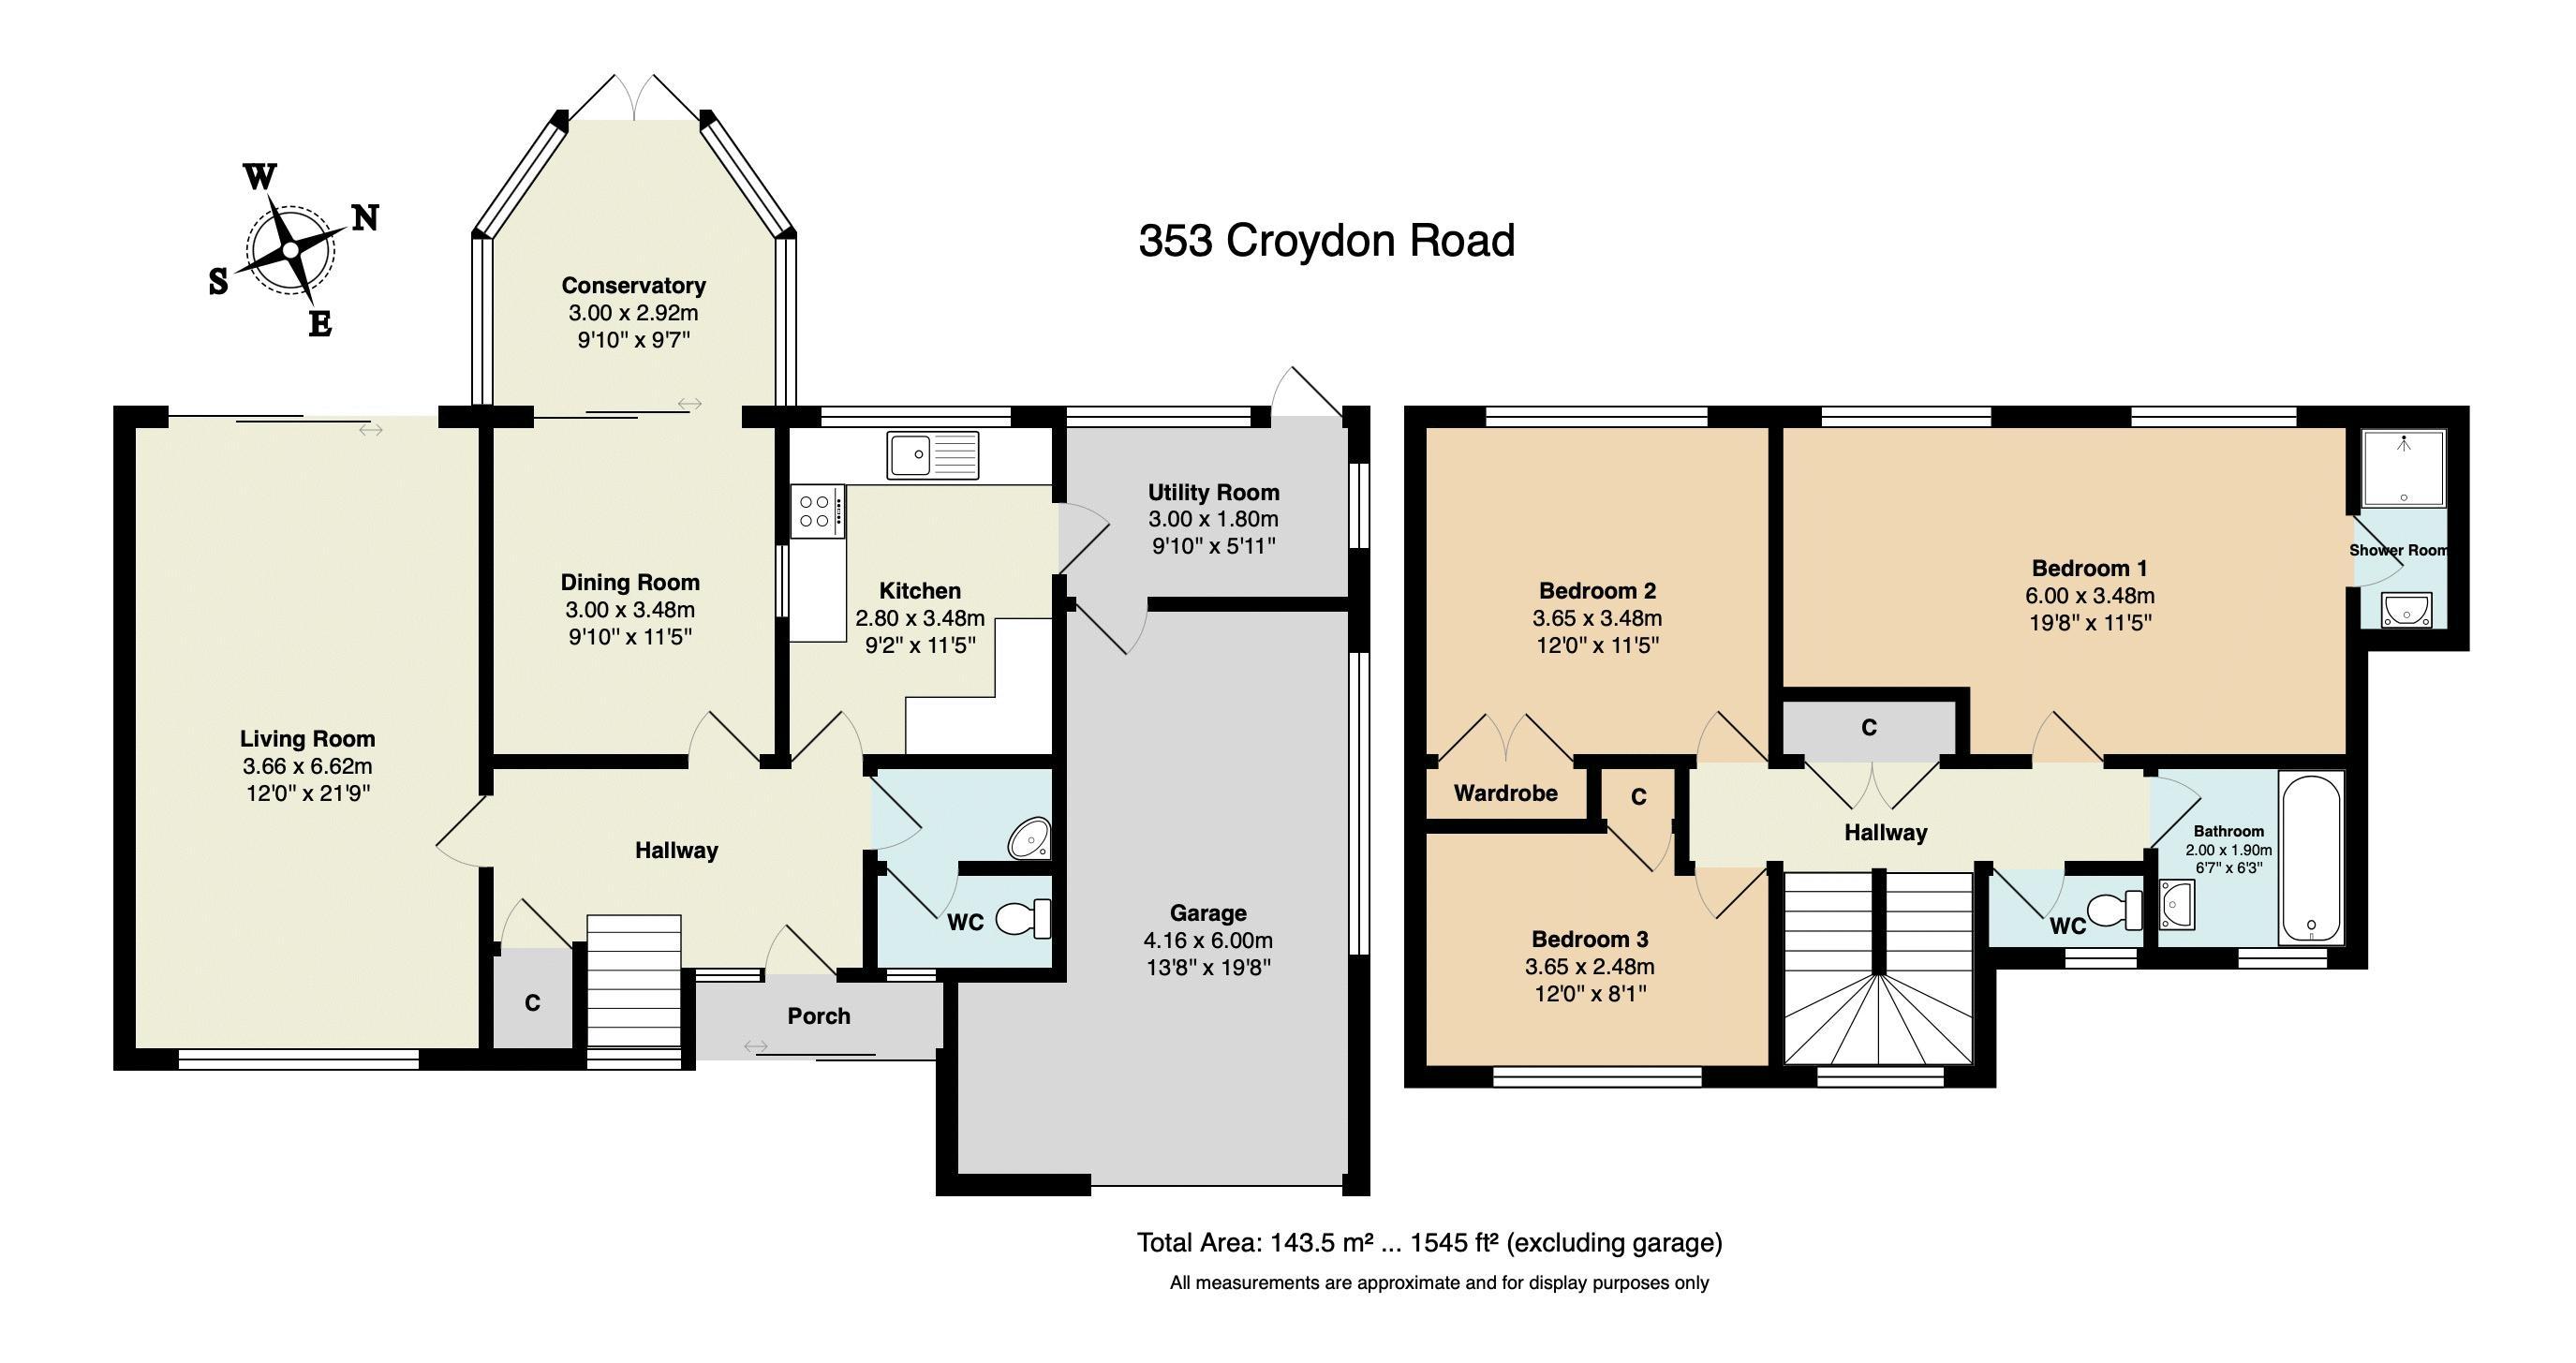 Croydon Road